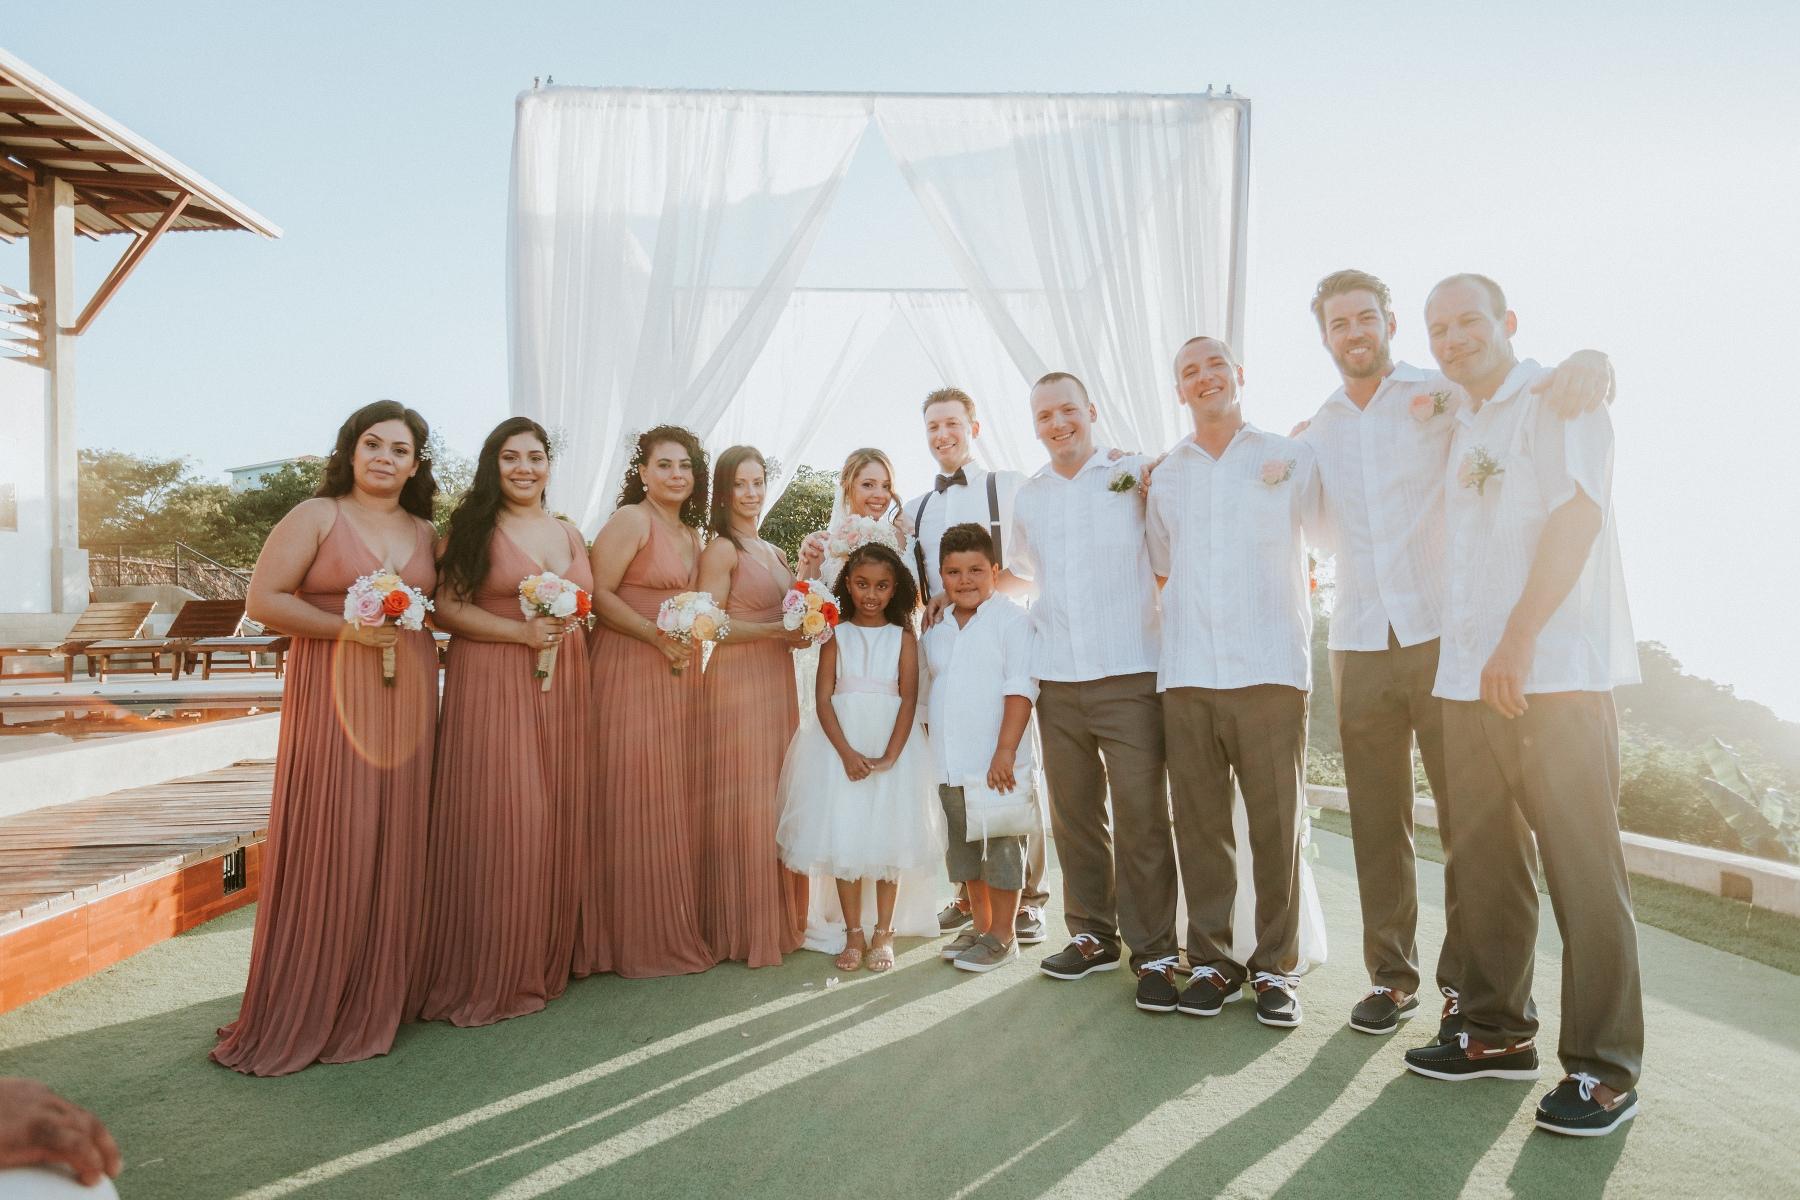 Family photography wedding Nicaragua. Photographer Nicaragua